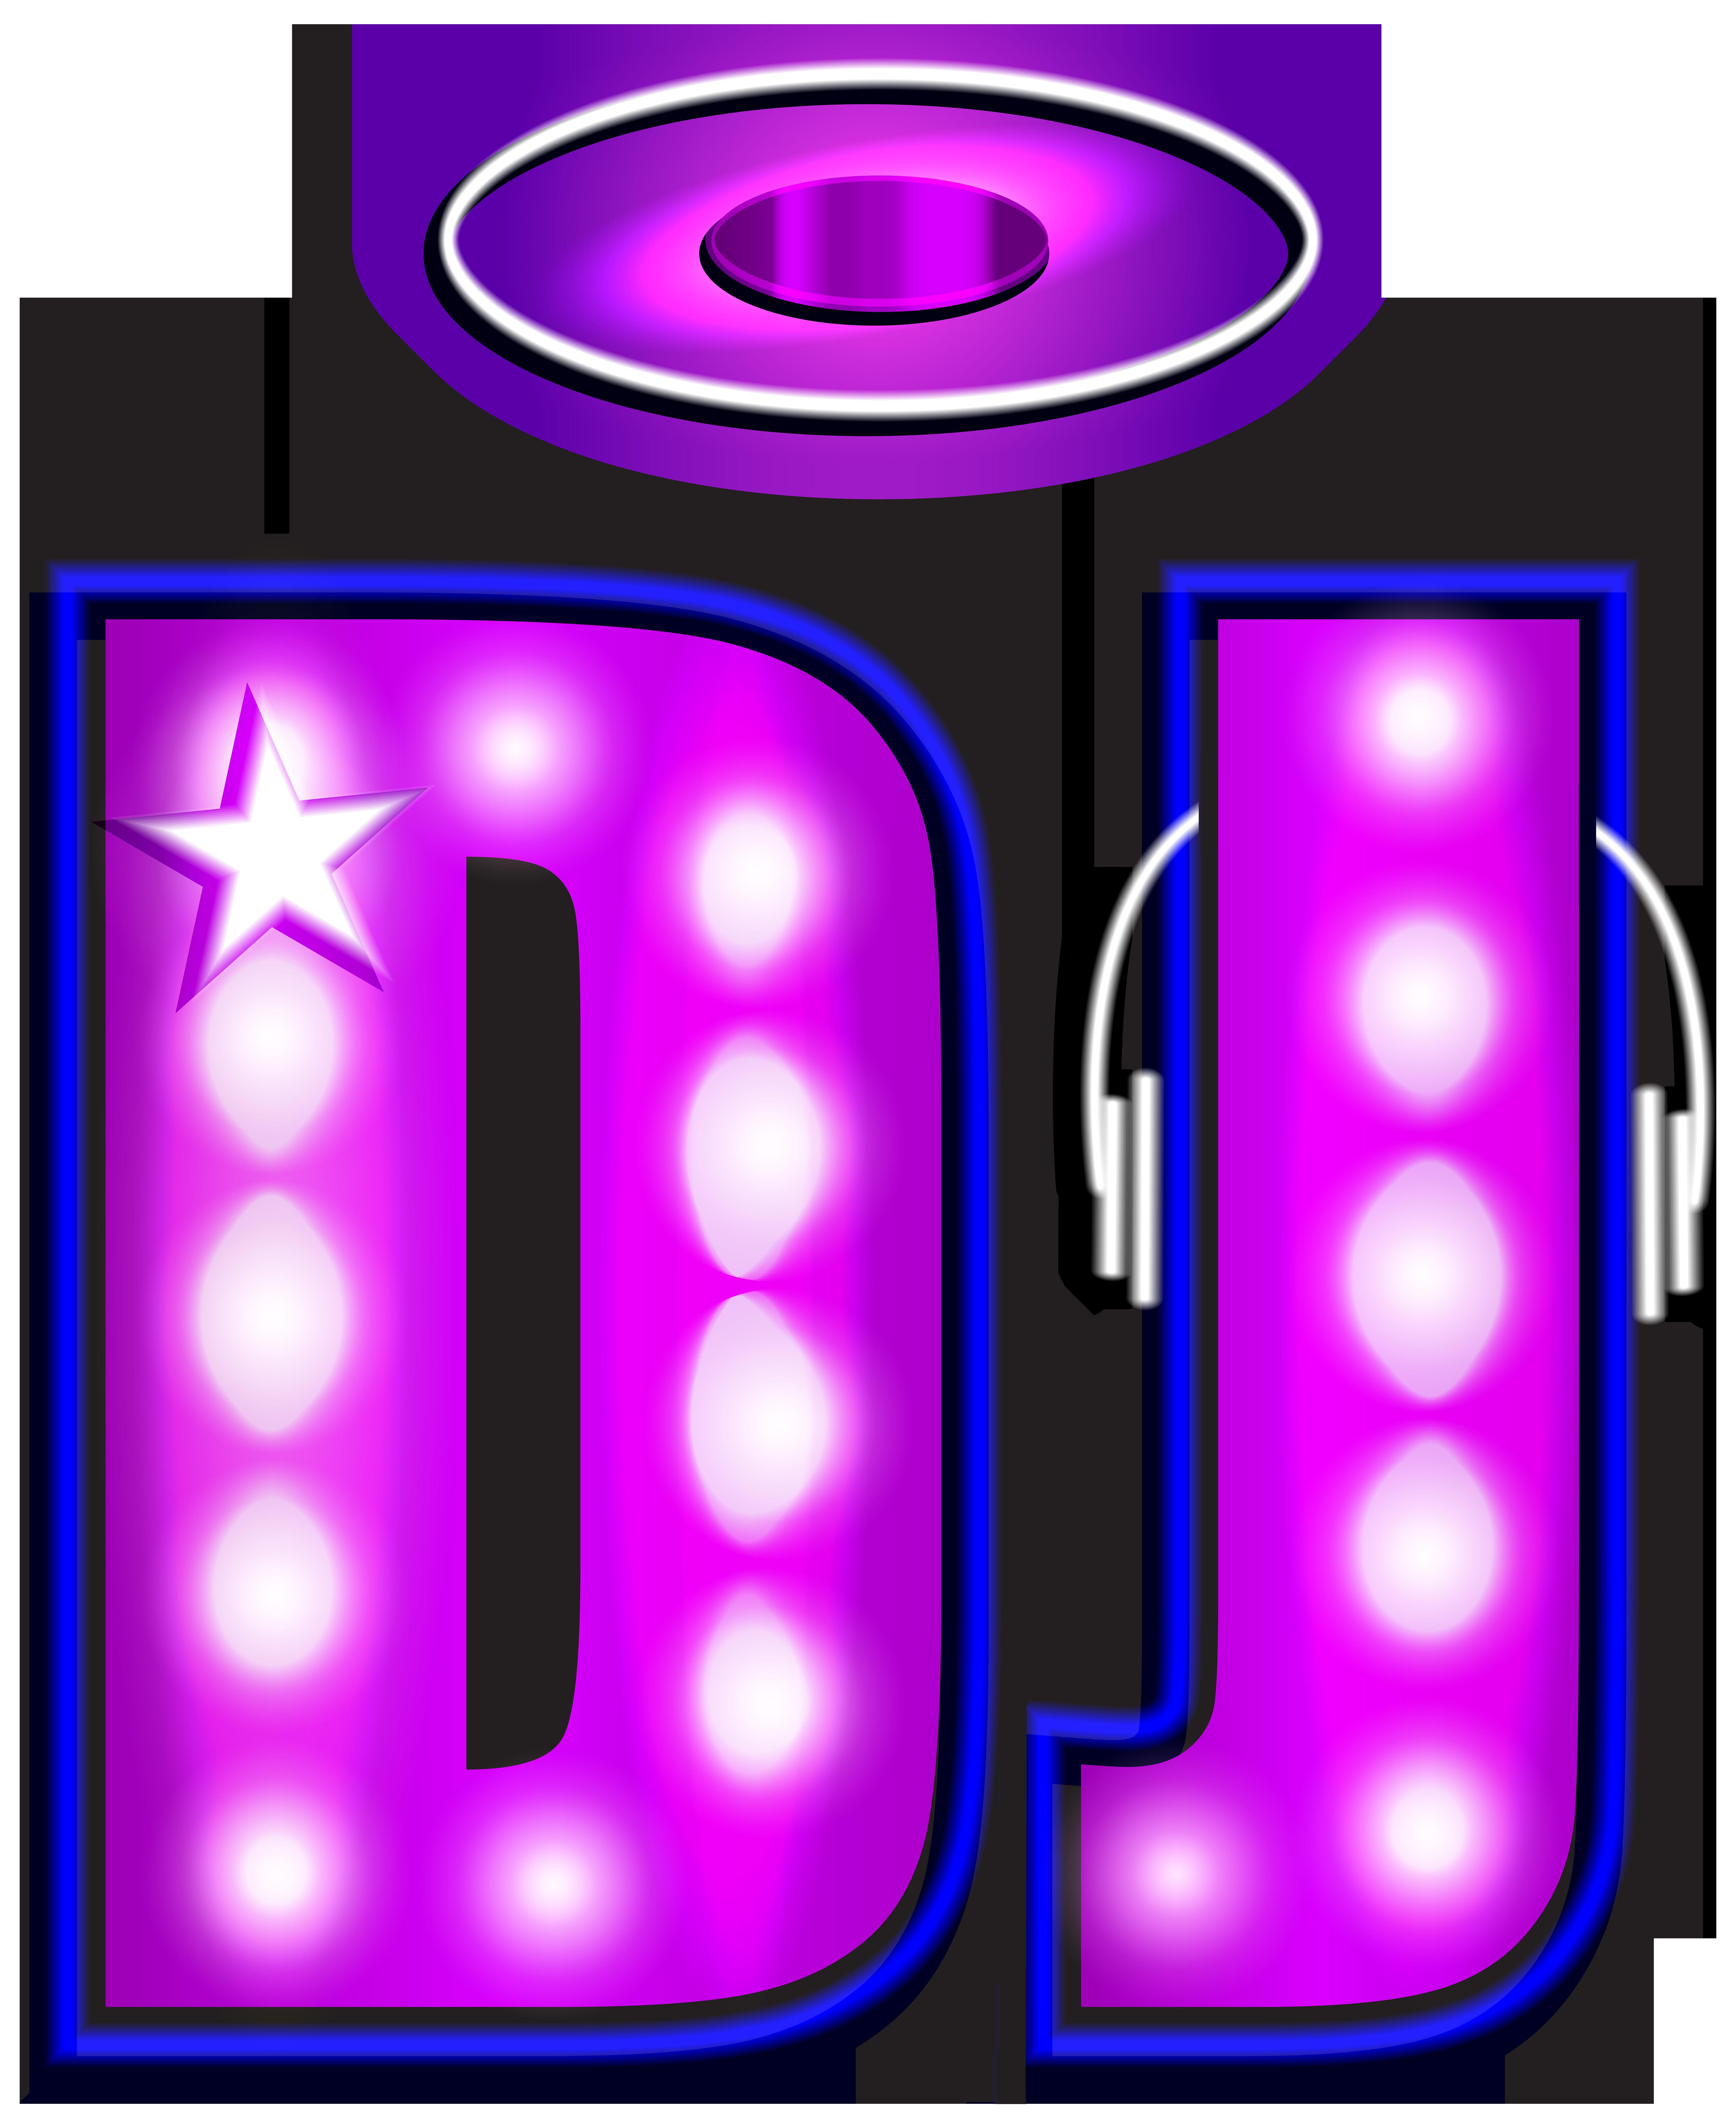 DJ Neon PNG Clip Art Image.